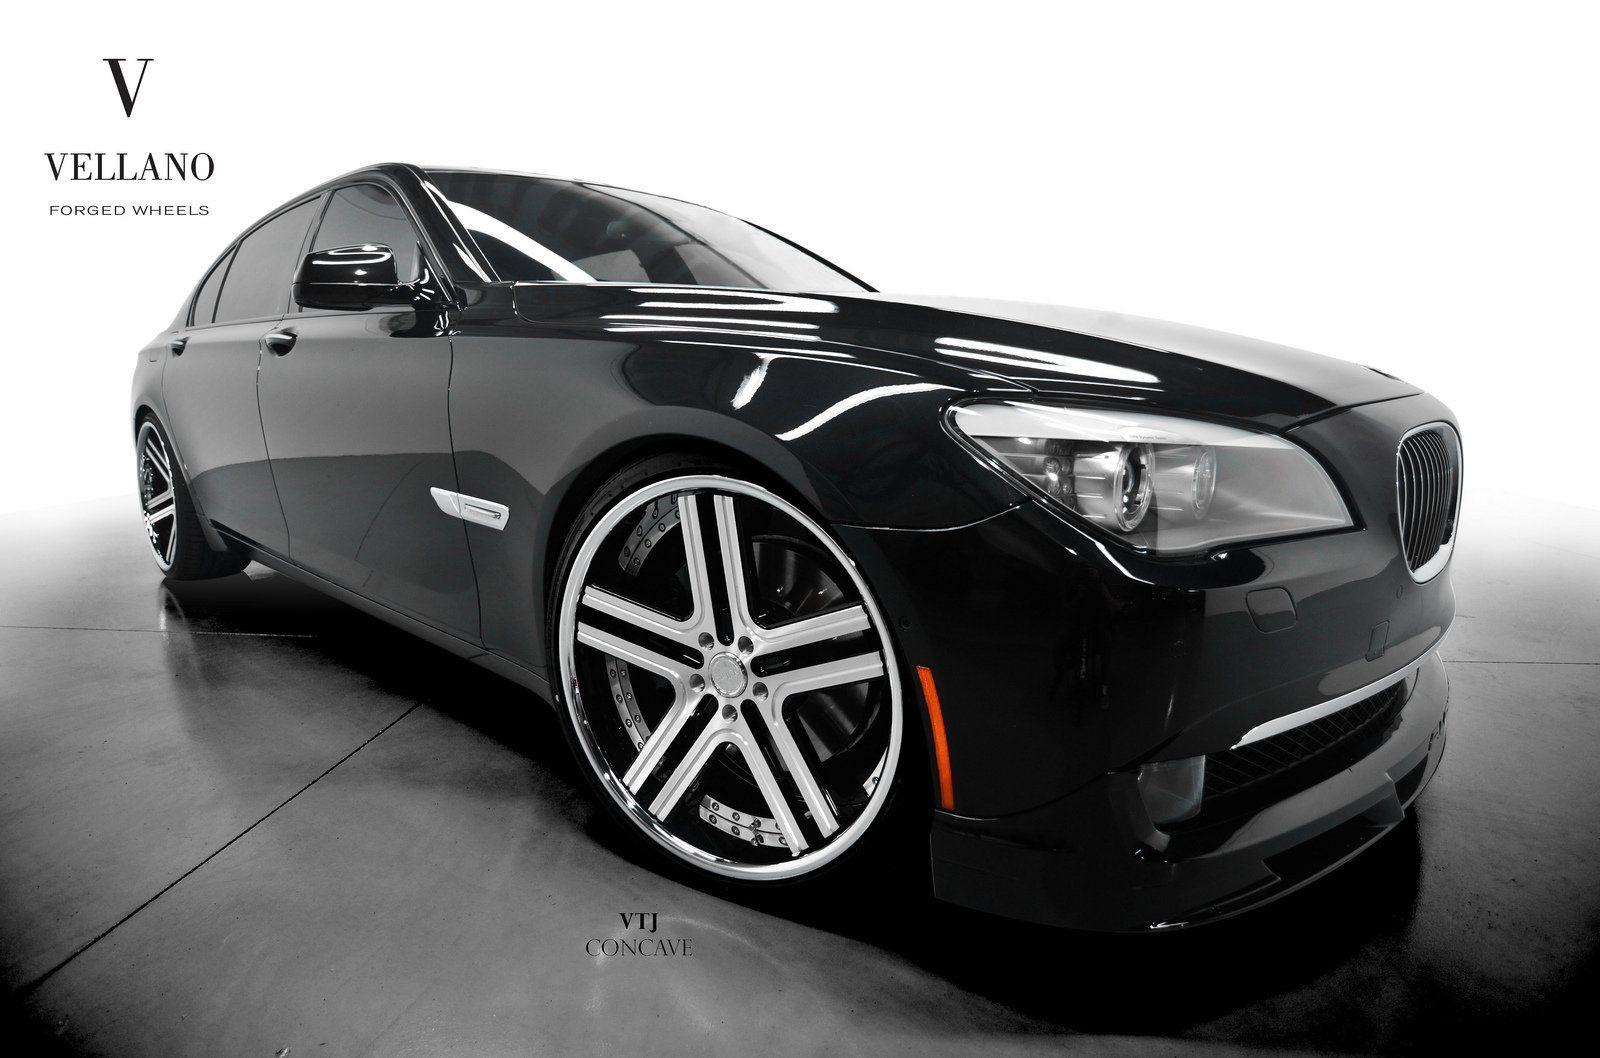 Bmw 7 Series Black Vellano Wheels Tuning Cars Wallpaper 1600x1058 392991 Wallpaperup Bmw Bmw 7 Series Car Tuning